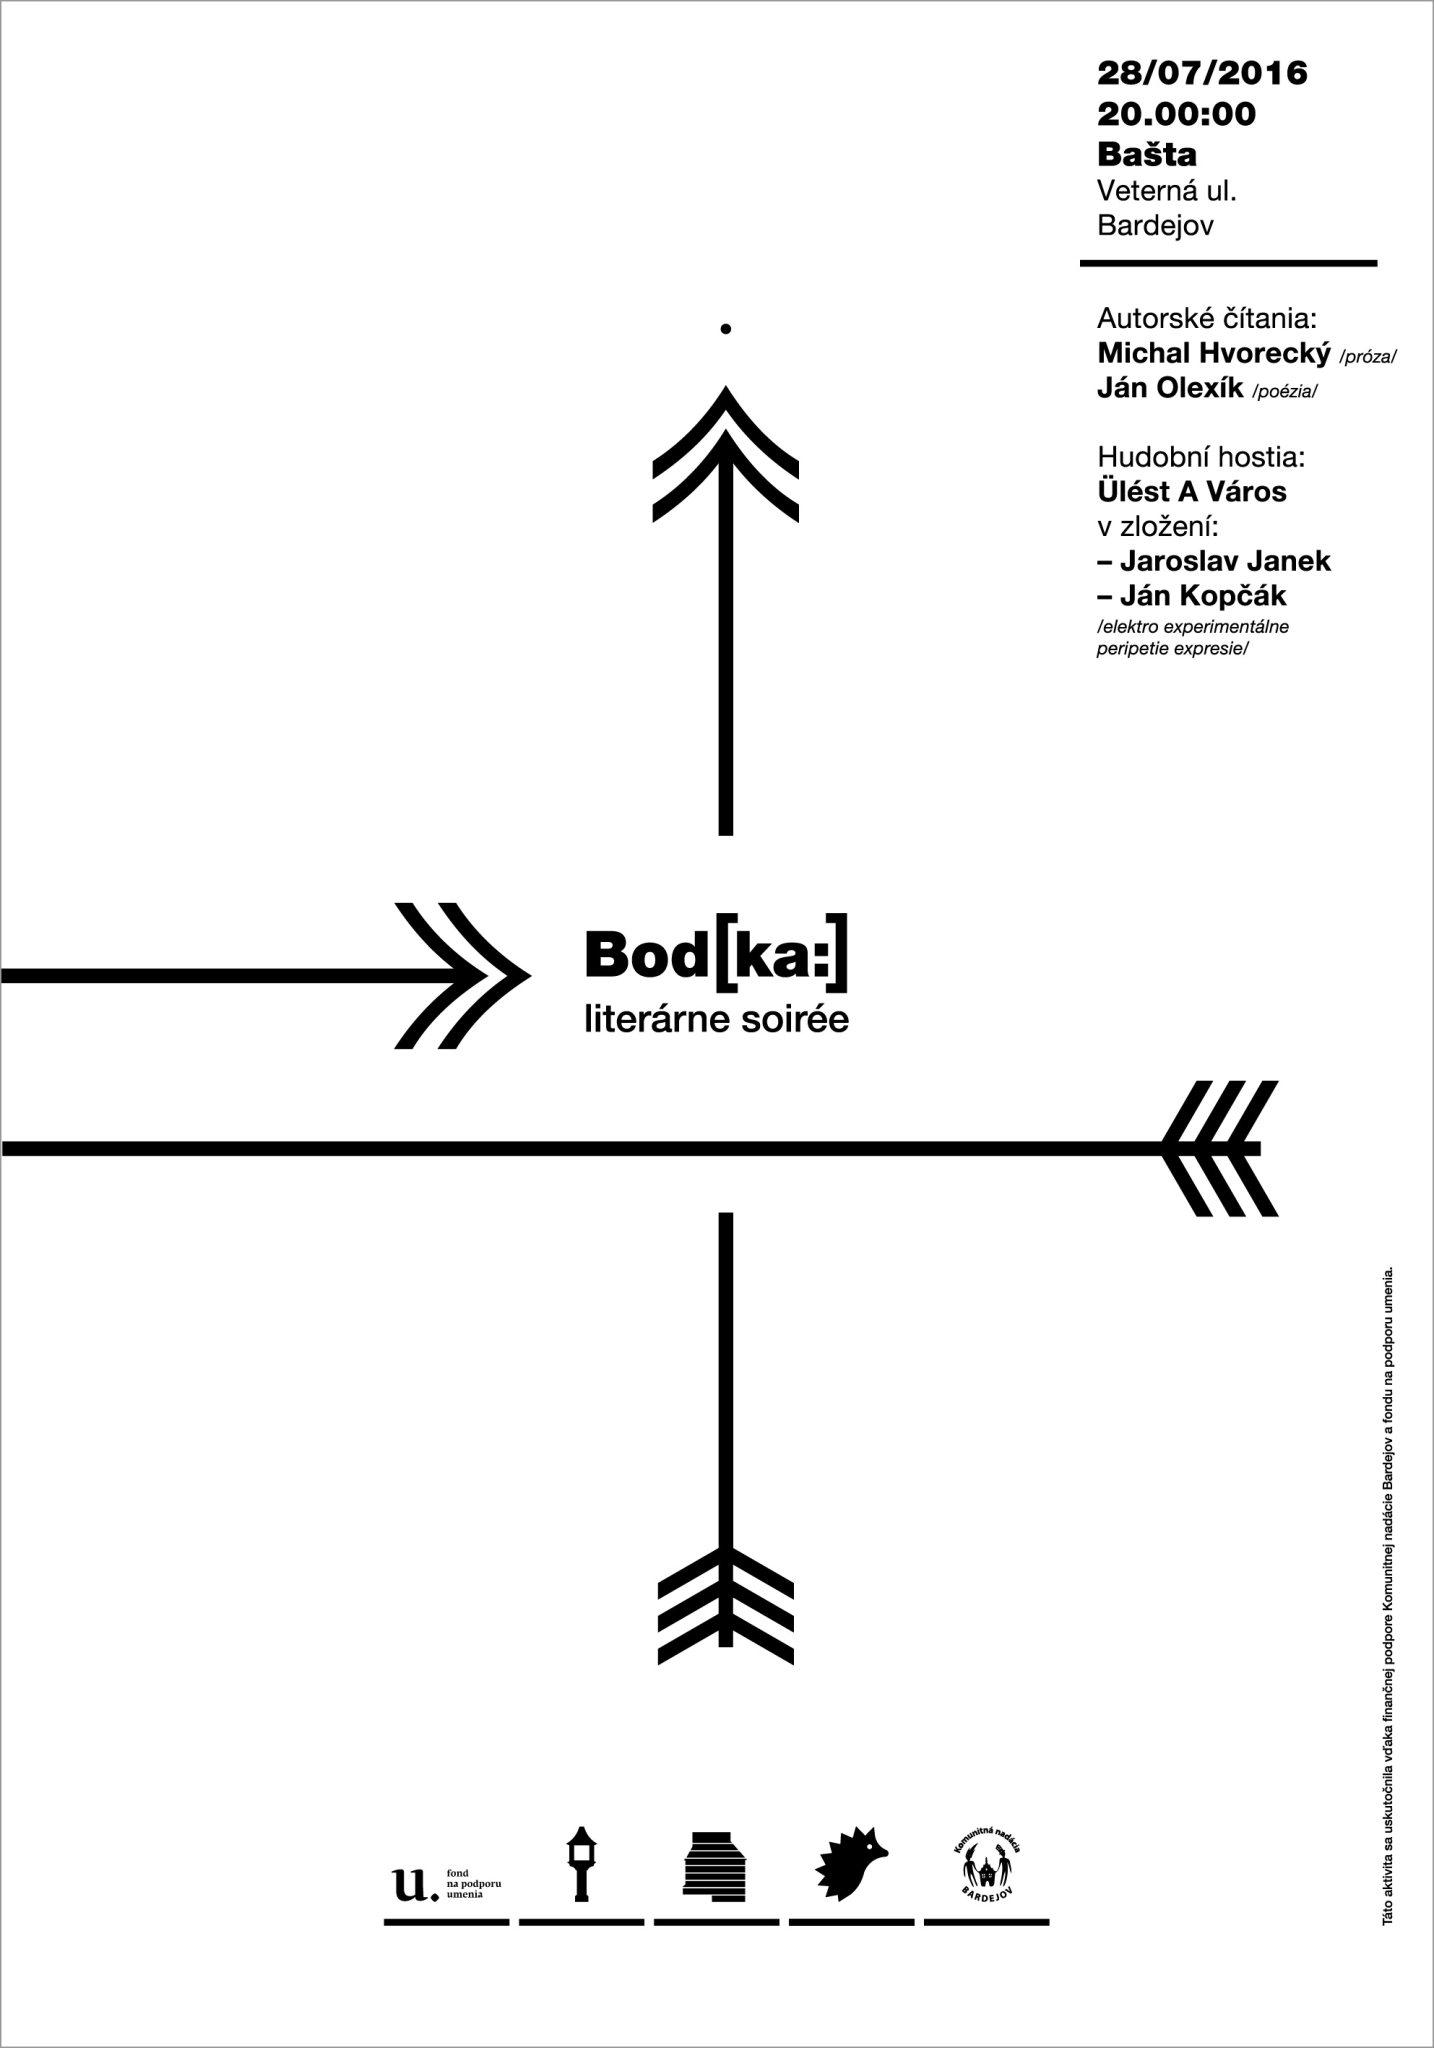 Poster_04_Bod_3A-Final